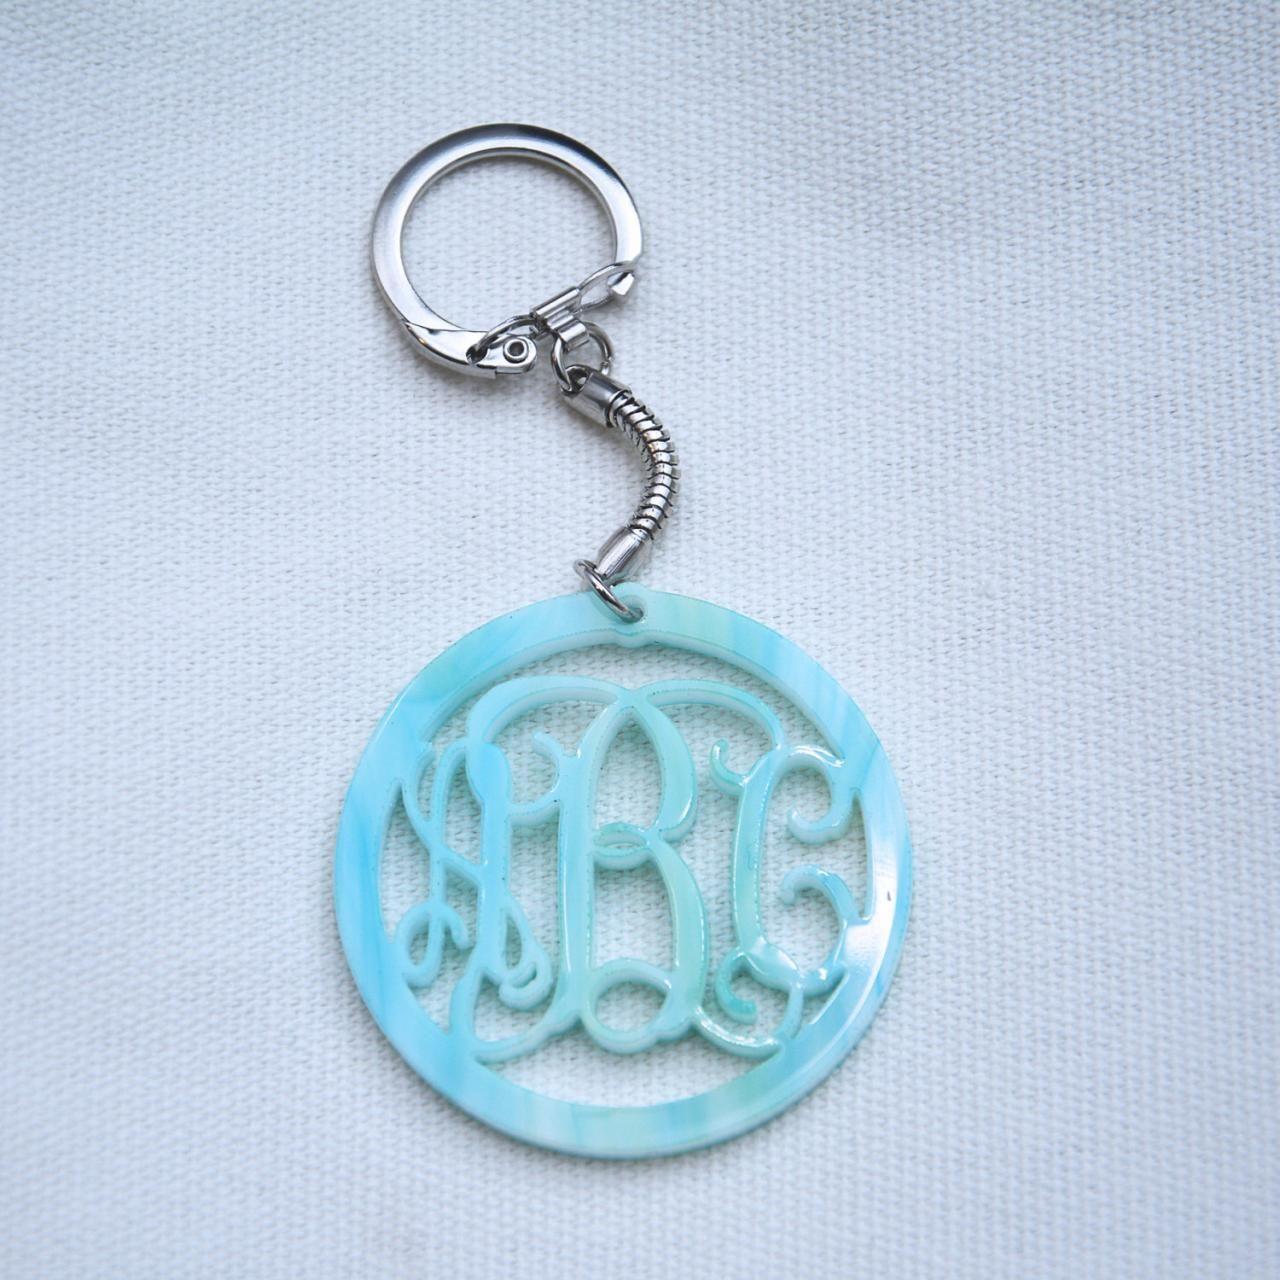 1.5 inch Personalized Monogram Acrylic Custom 3 Initials Monogram Bracelet